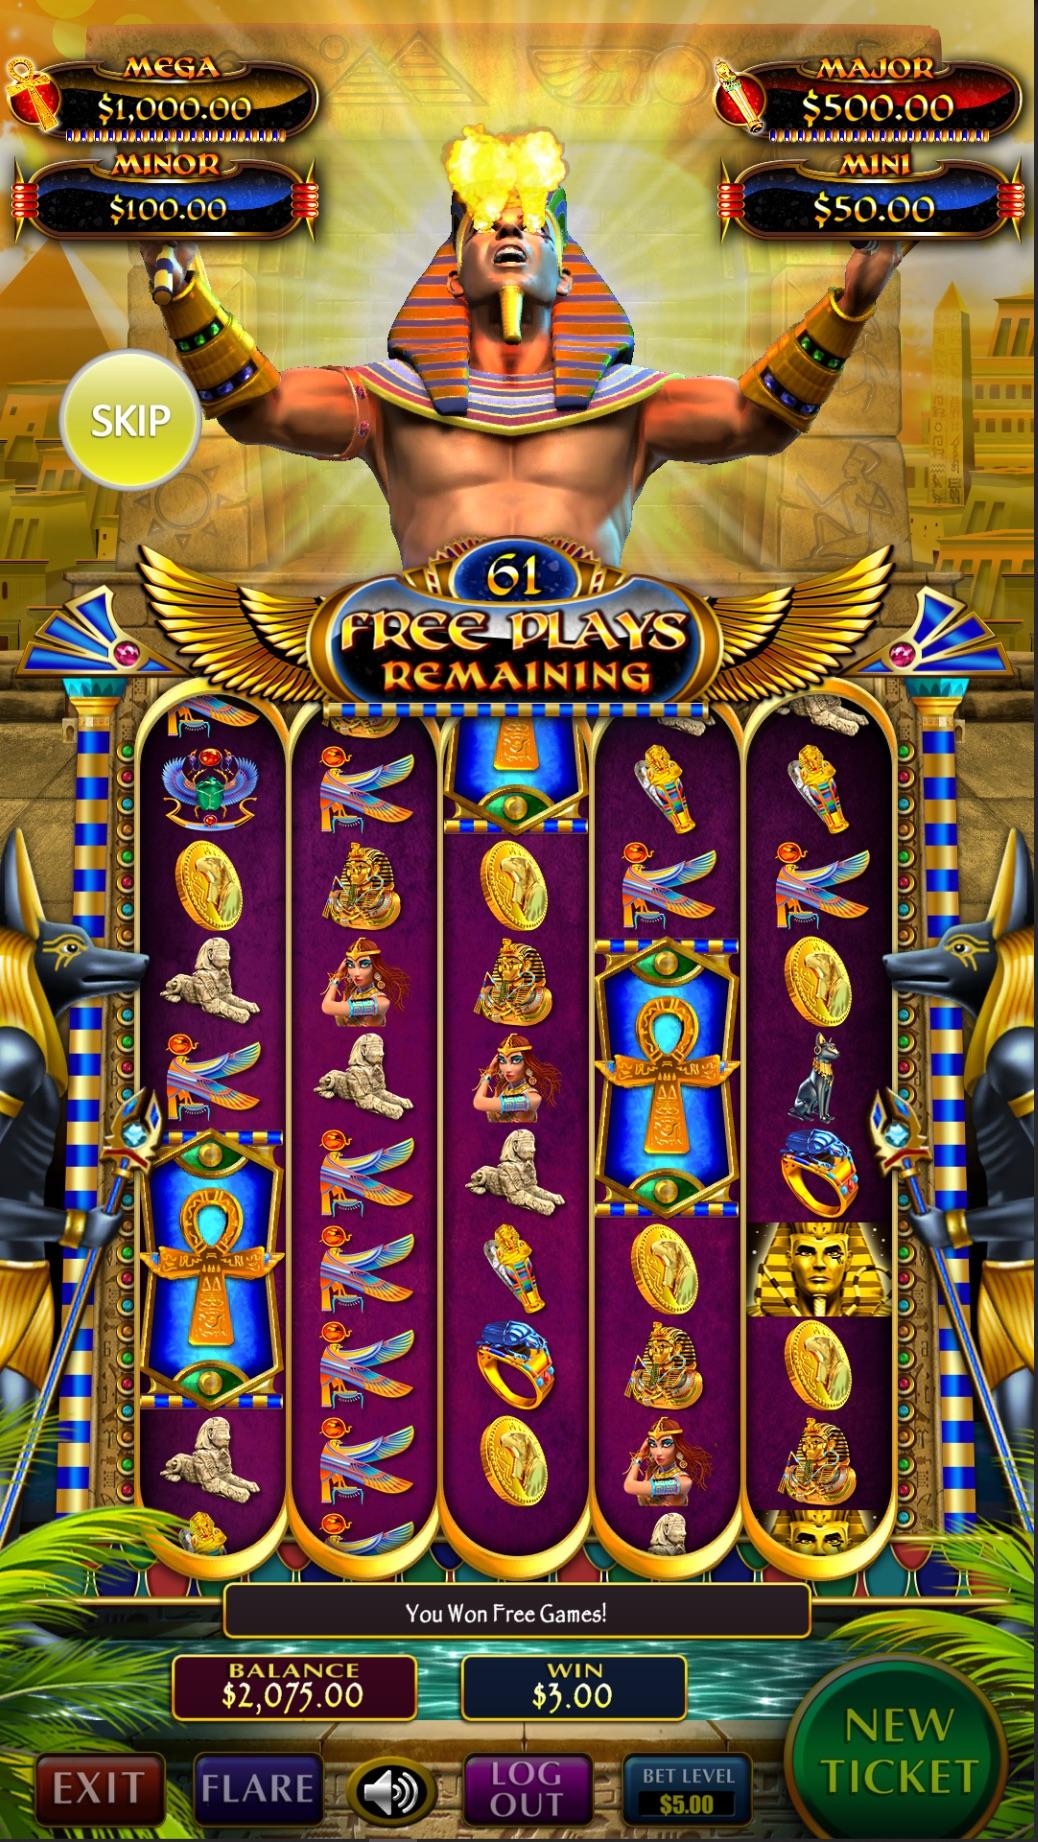 Golden-Pharaoh-Vertical-pull-tab-game-screen-shot